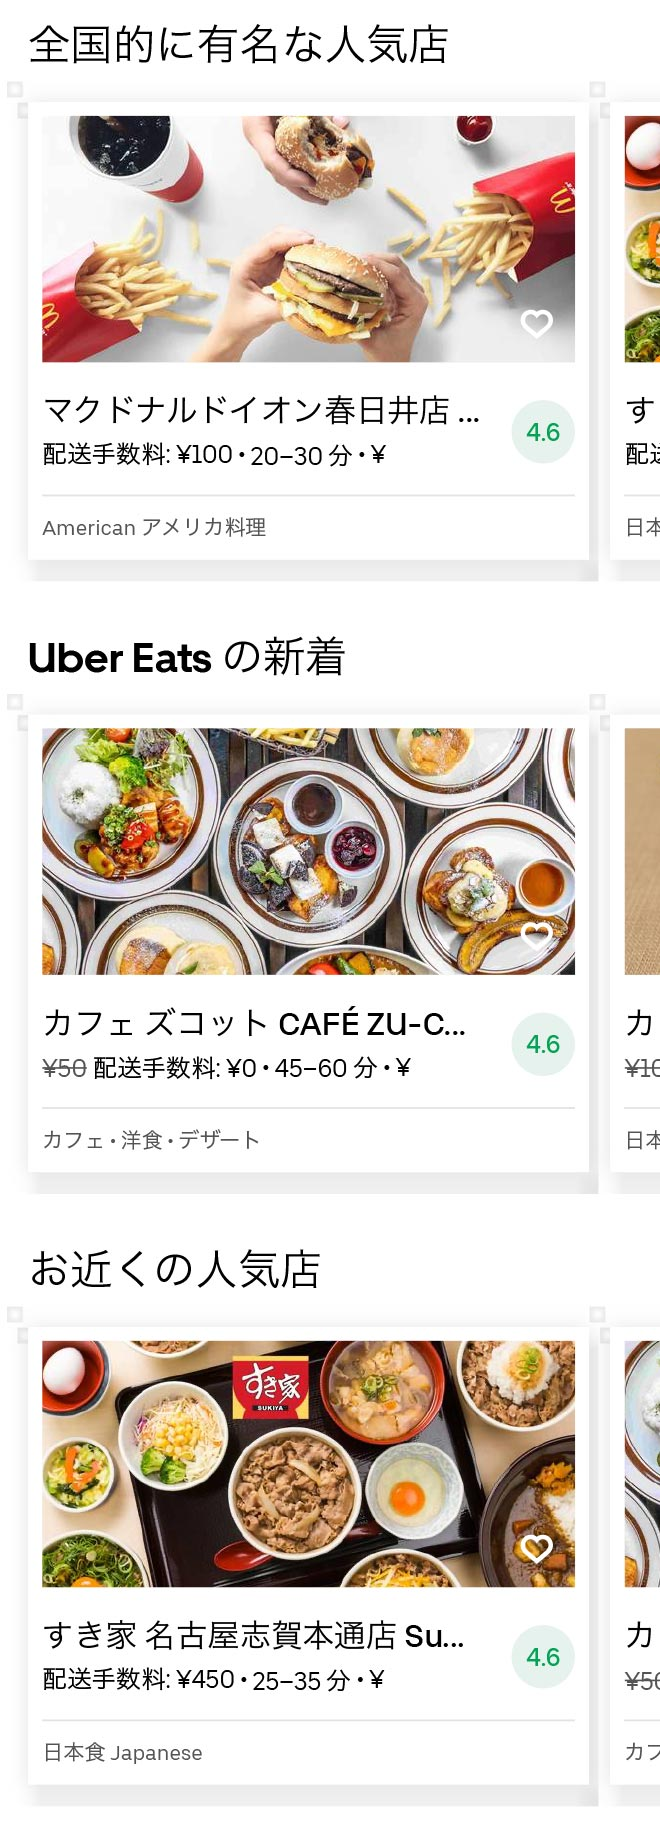 Kachigawa menu 2010 01